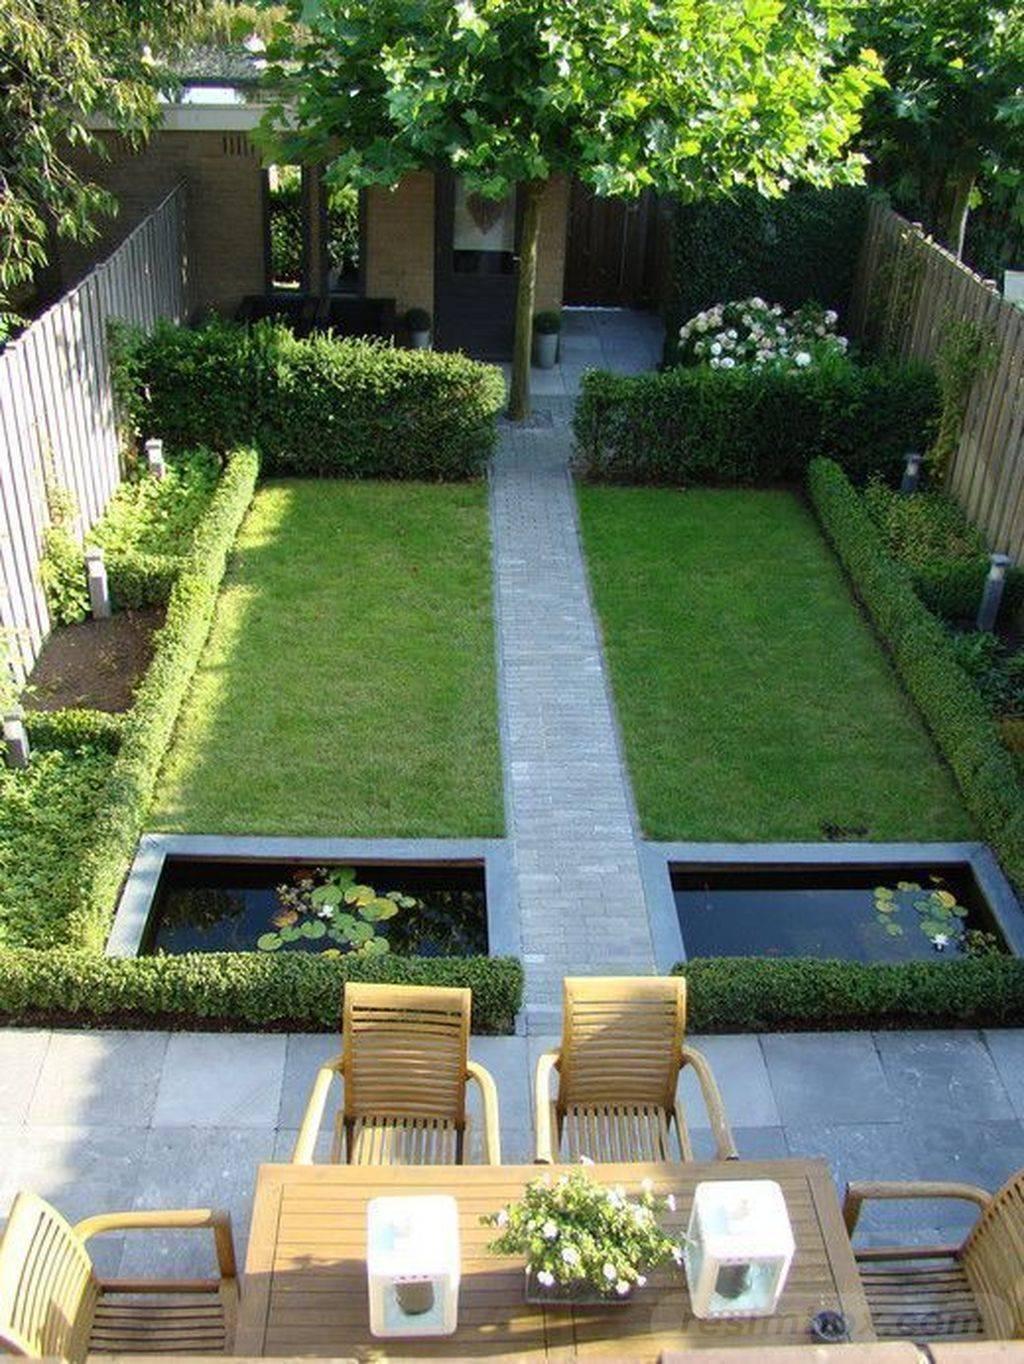 amazing garden ideas-797489046497768104